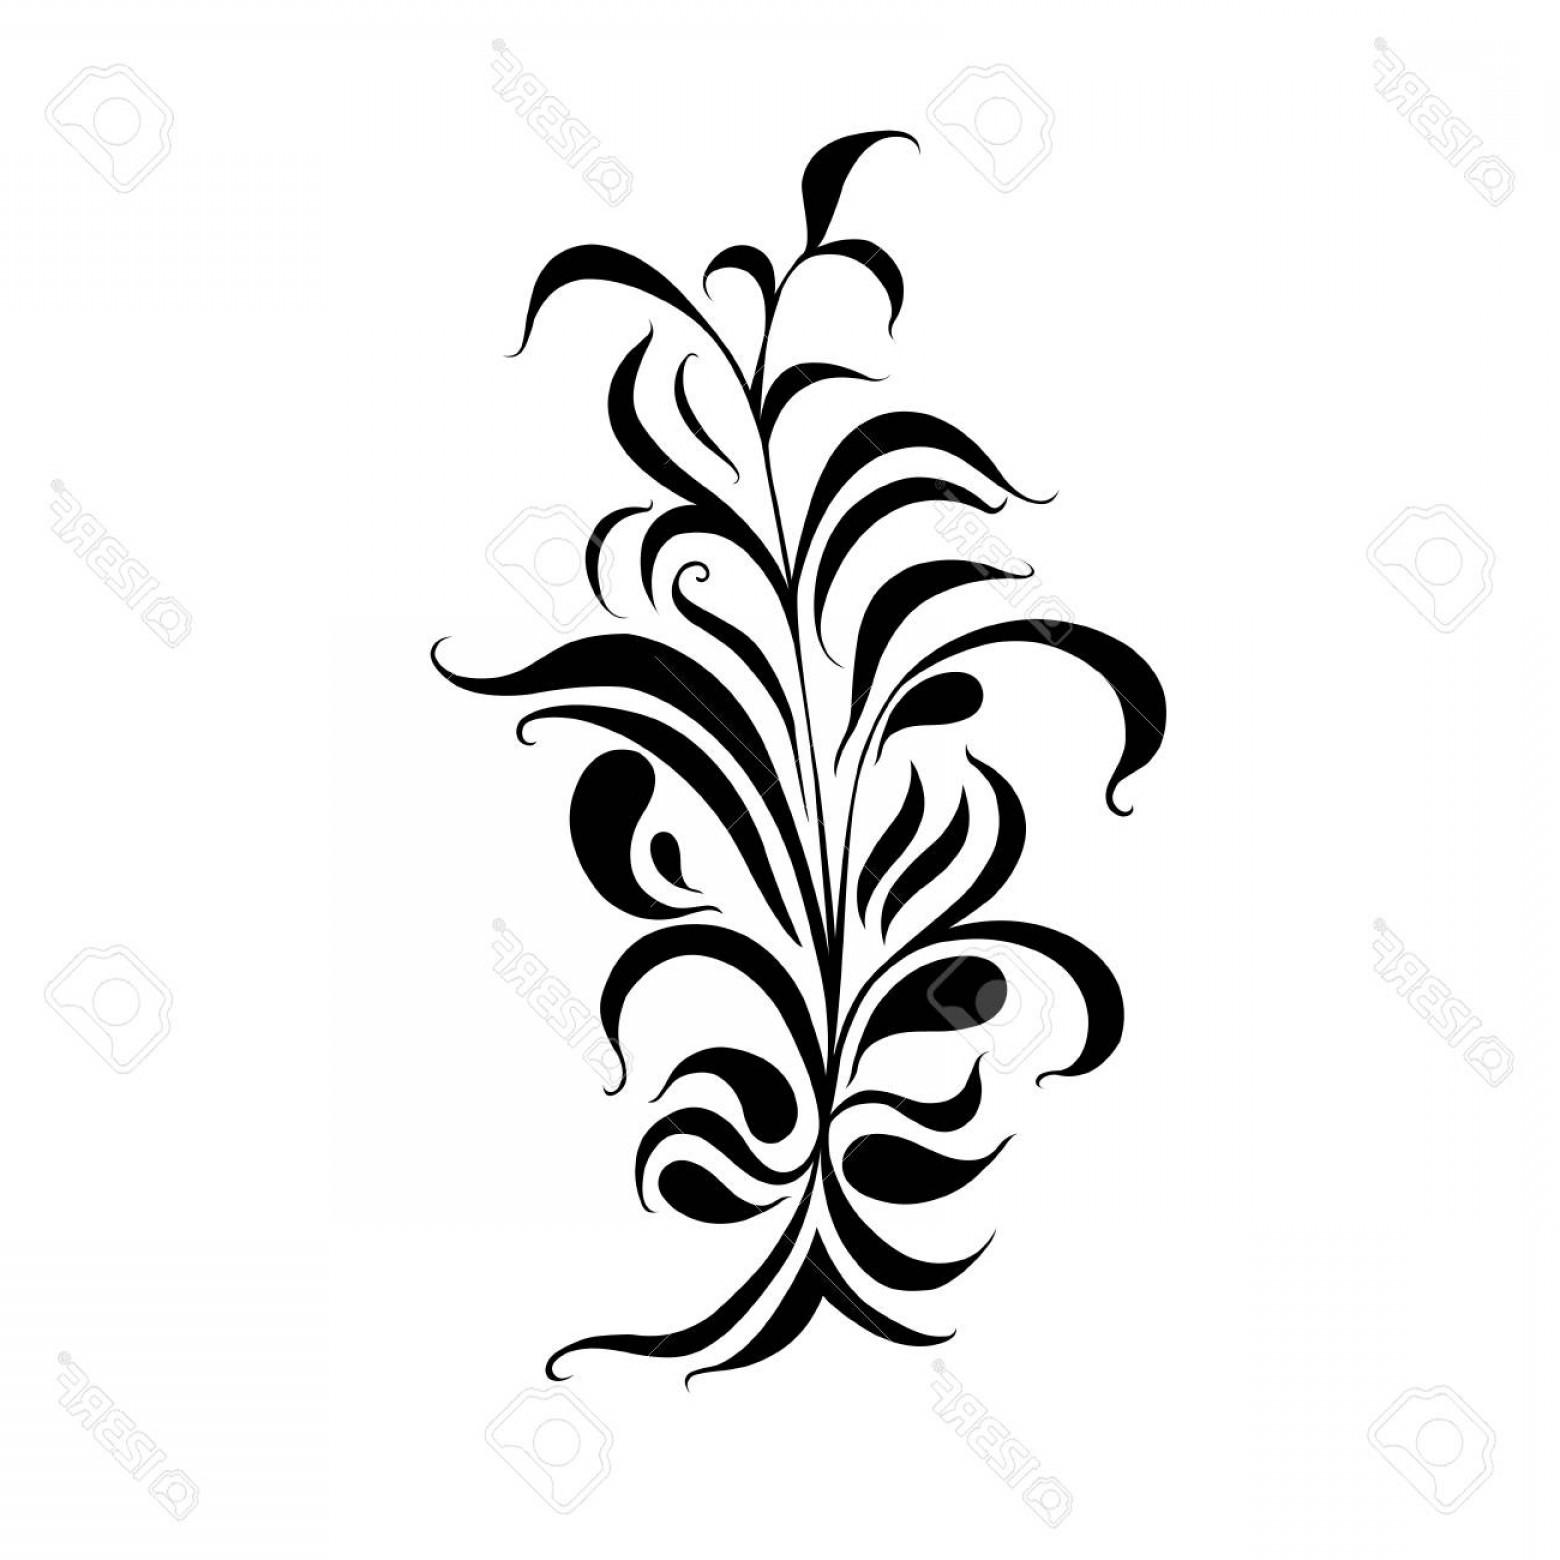 1560x1560 Photostock Vector Floral Corner Border Decorative Design Element